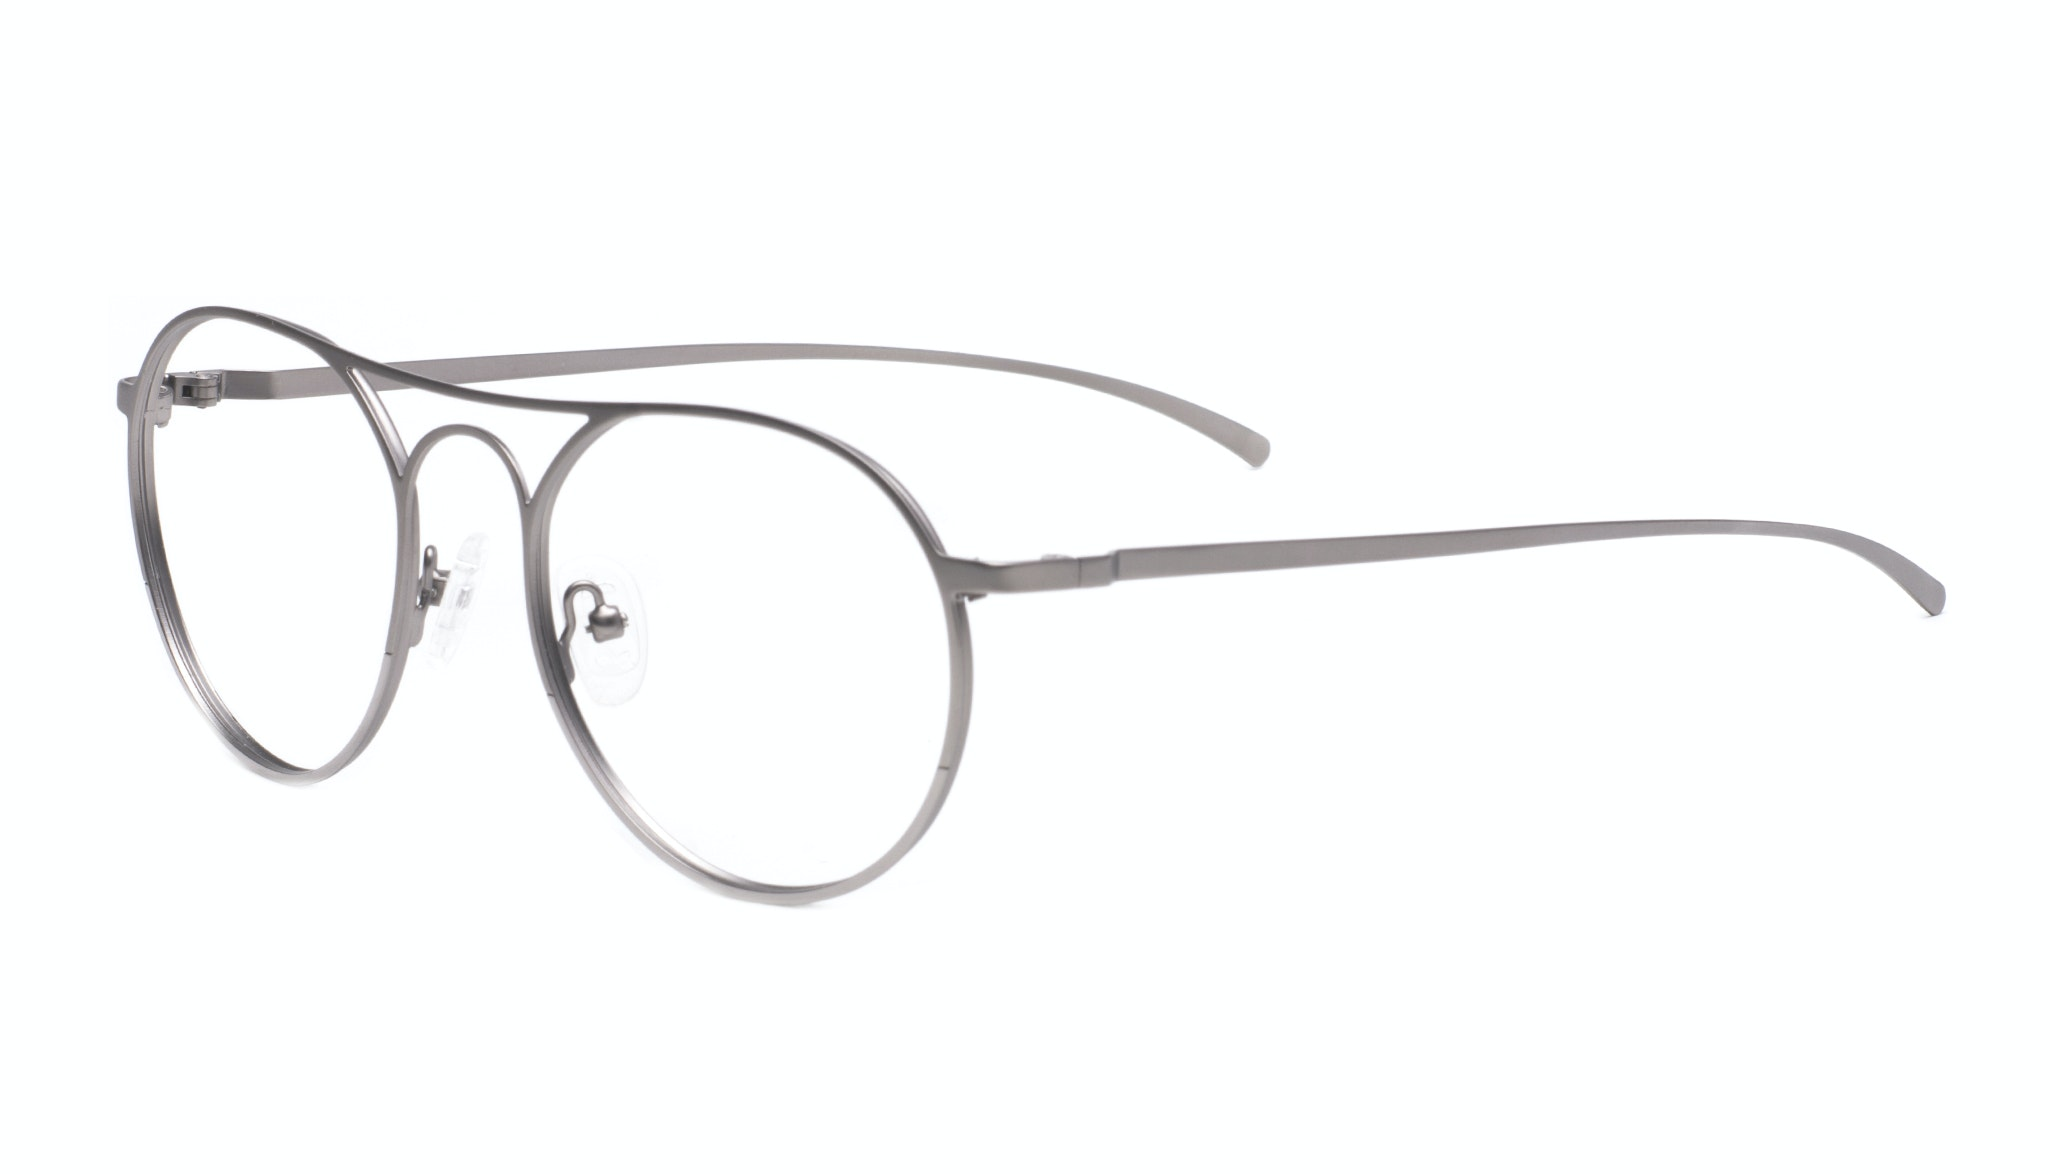 Affordable Fashion Glasses Aviator Round Eyeglasses Men Contour Silver Tilt